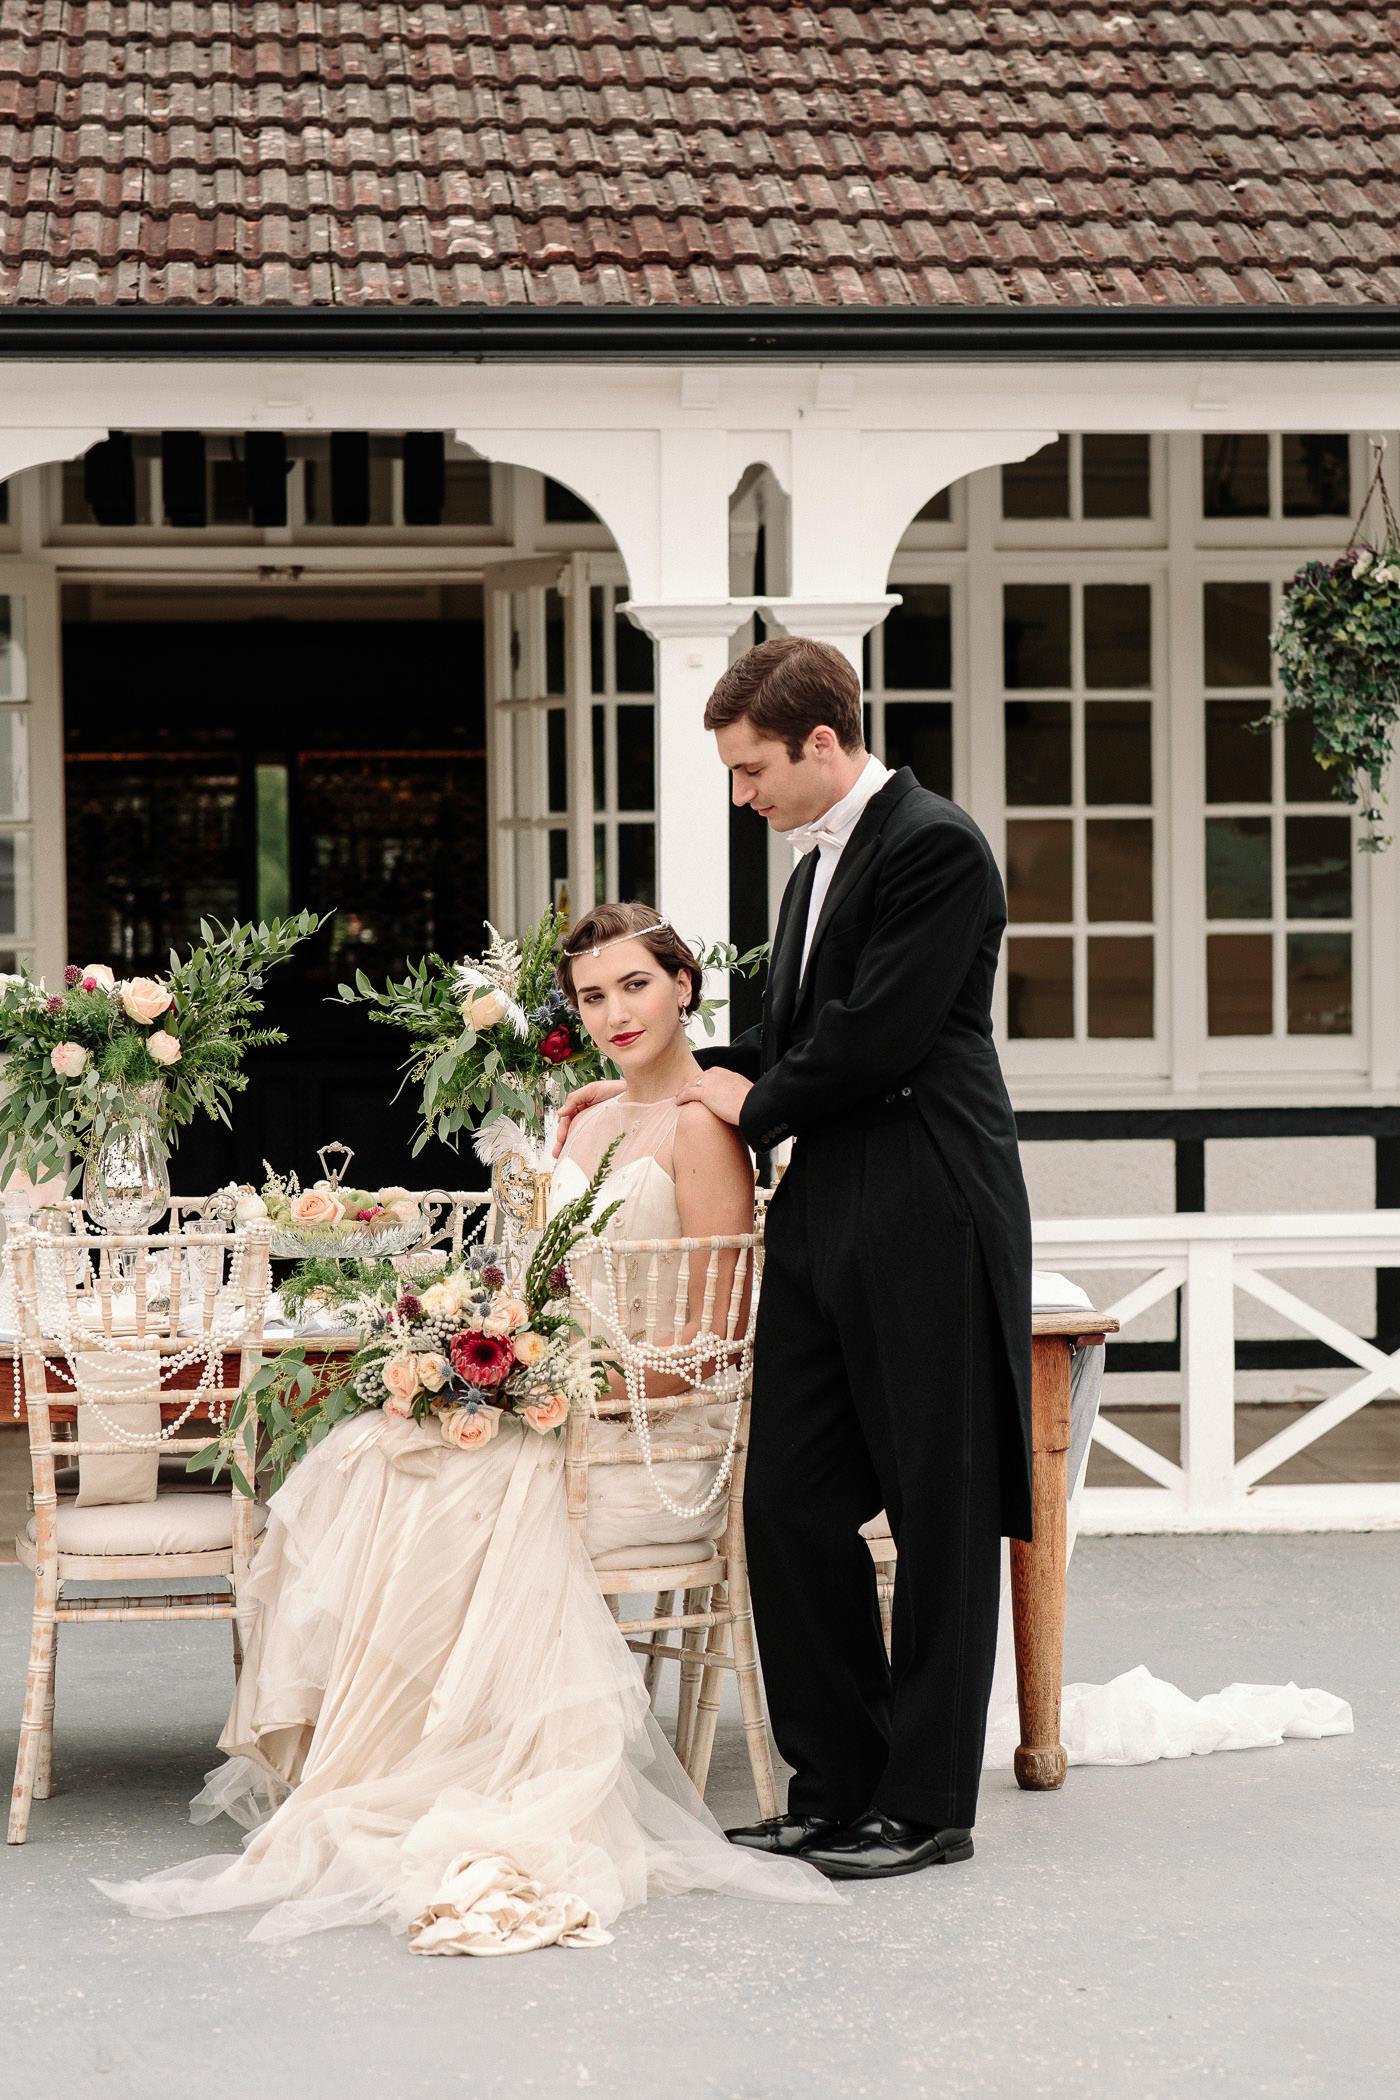 wedding-photographer-hertfordshire-45.jpg